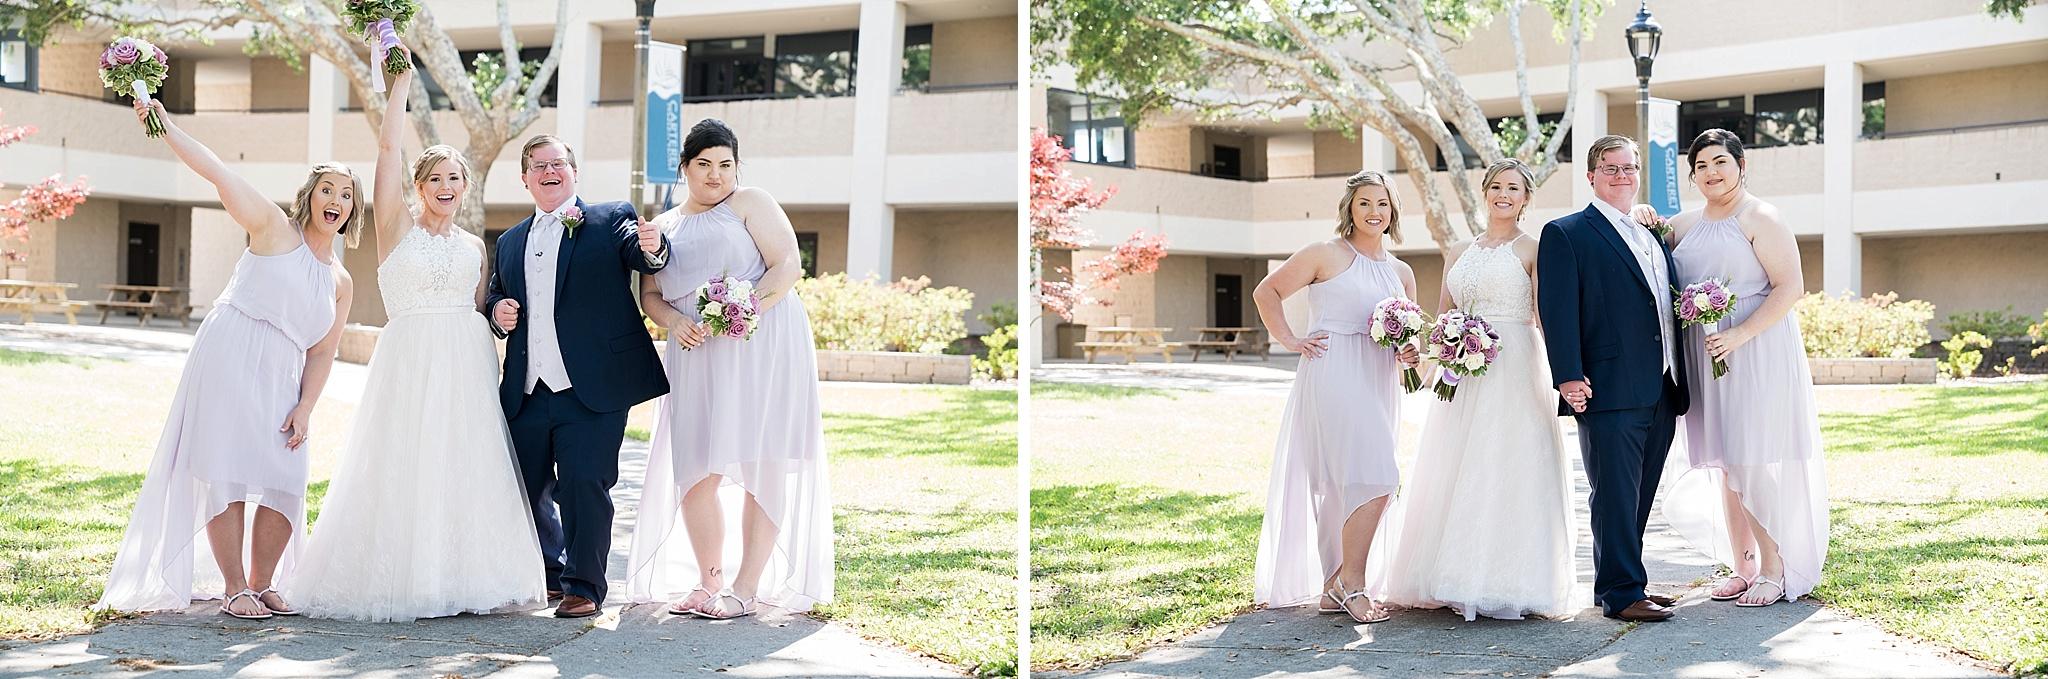 Crystal-Coast-Wedding-Photographer-011.jpg